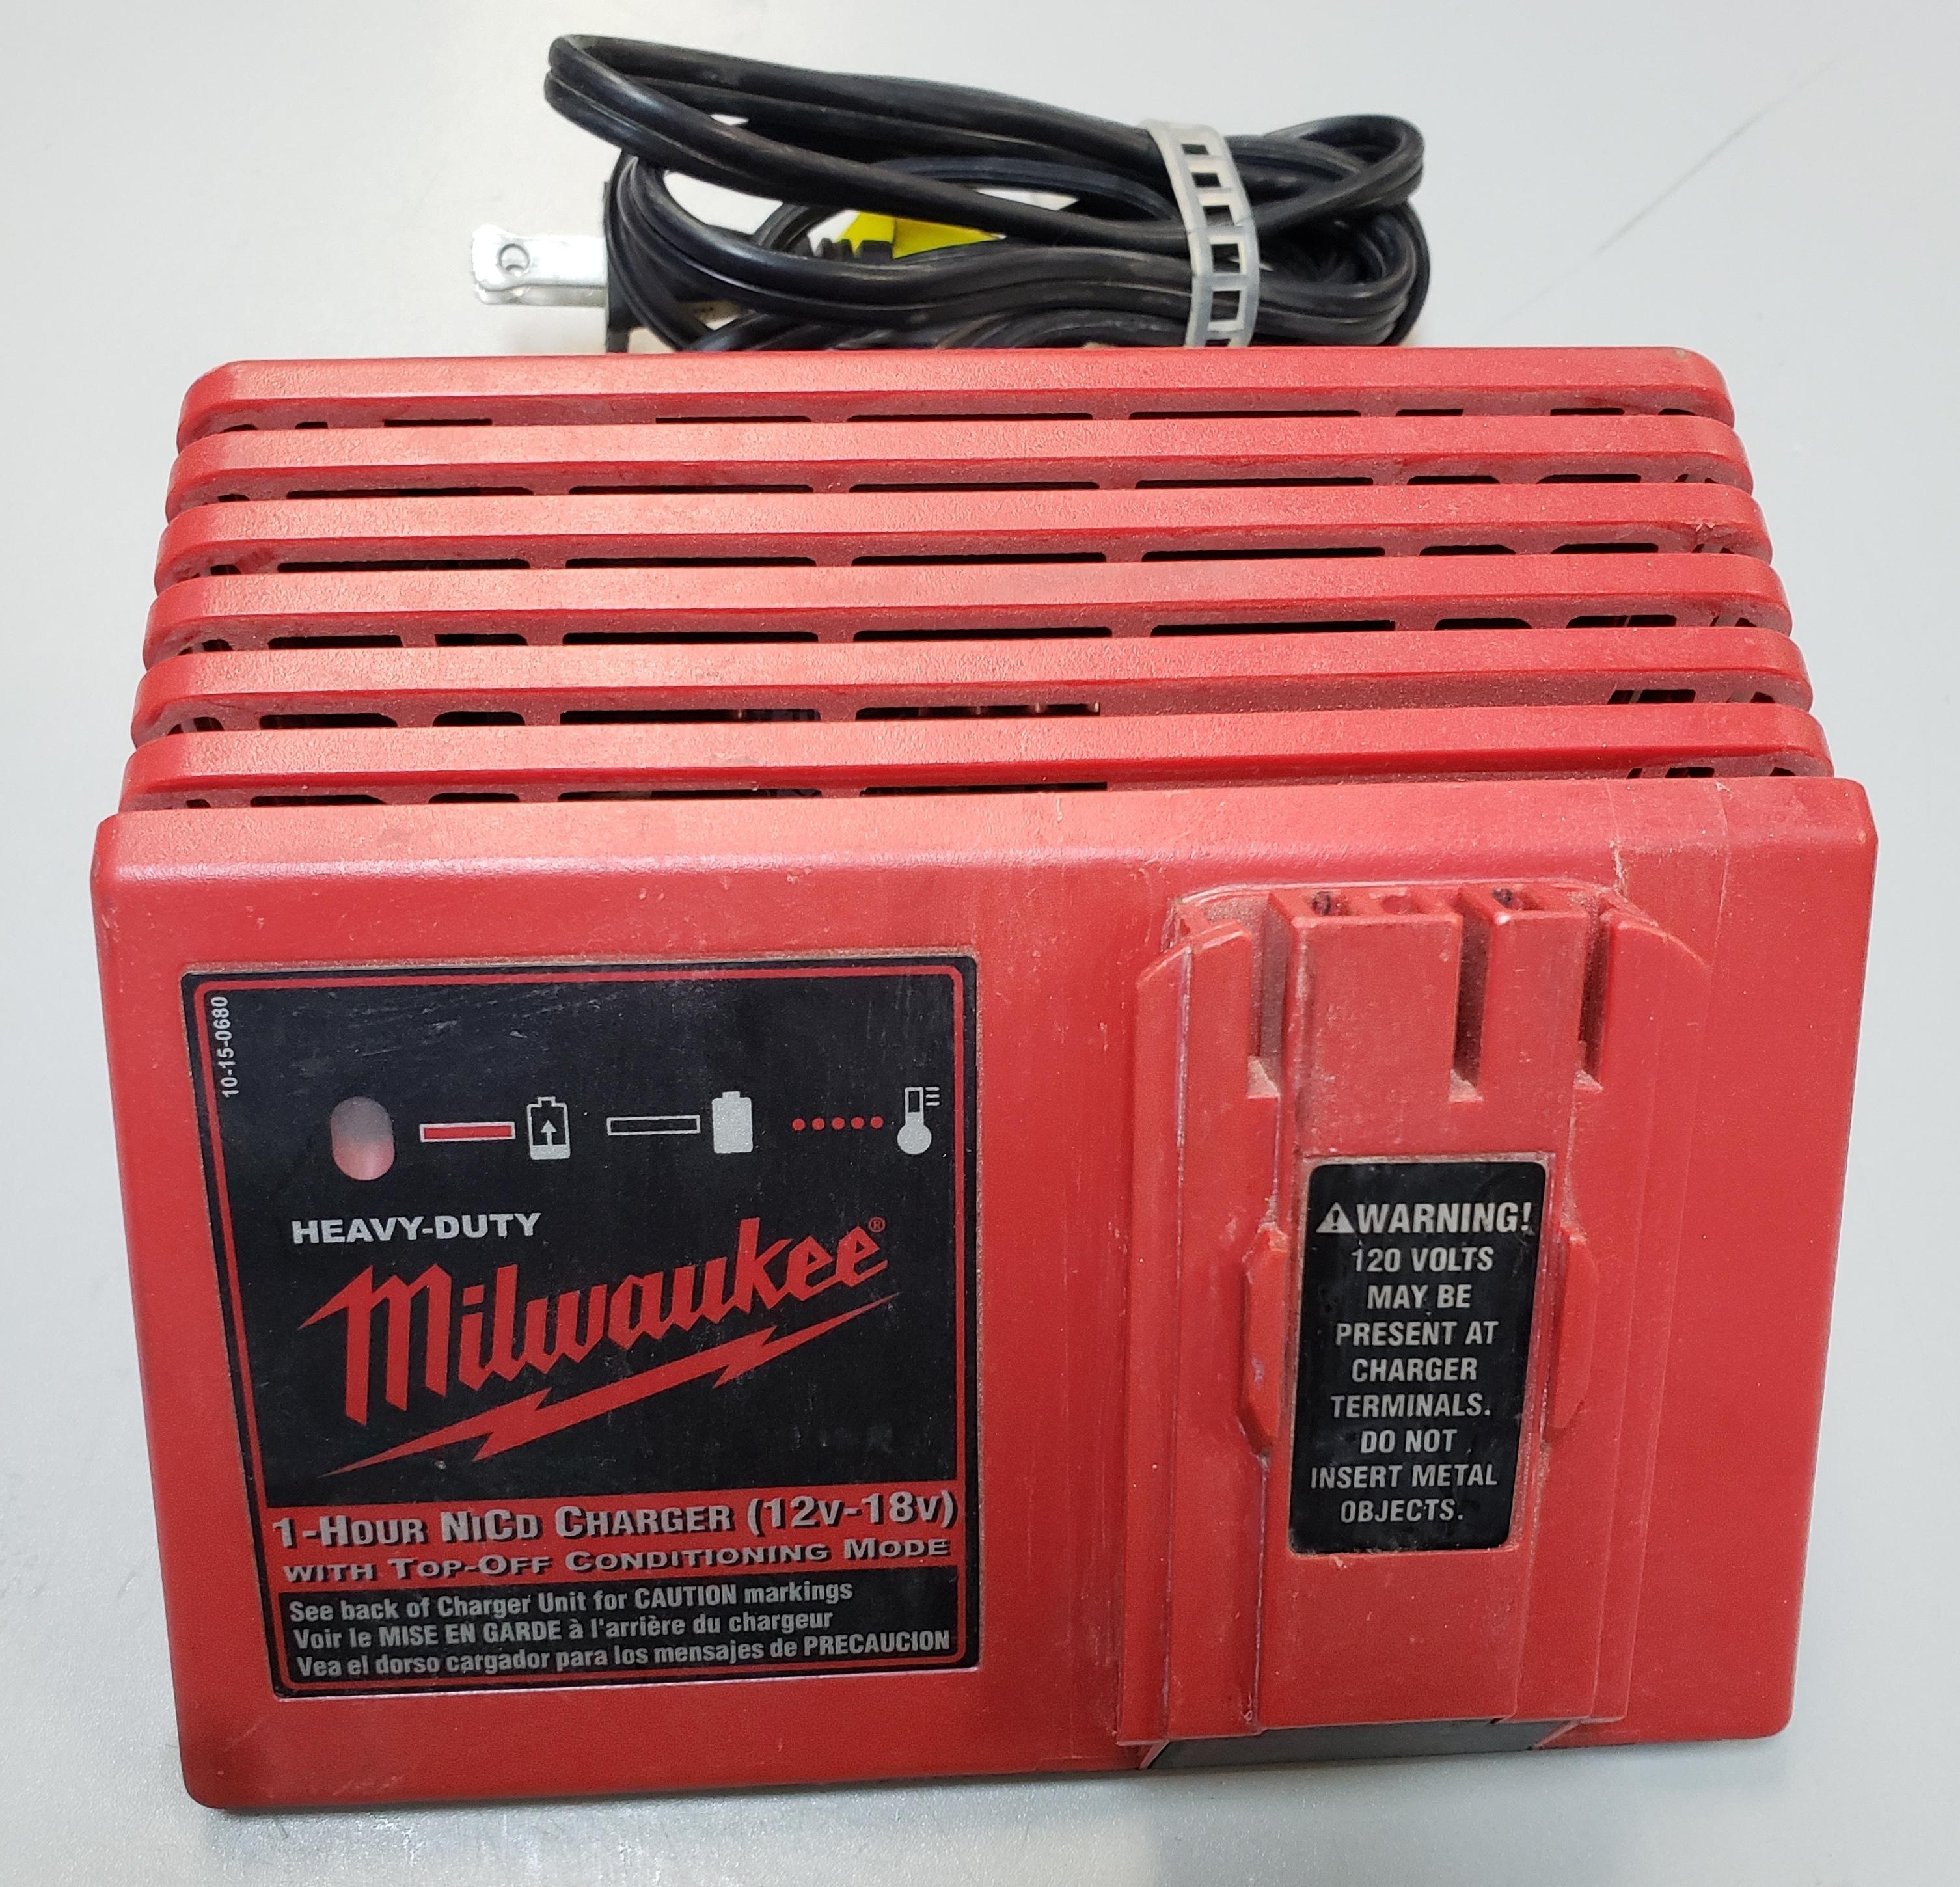 MILWAUKEE - 48-59-0255 - 1-HOUR NICD BATTERY CHARGER (12V-18V)